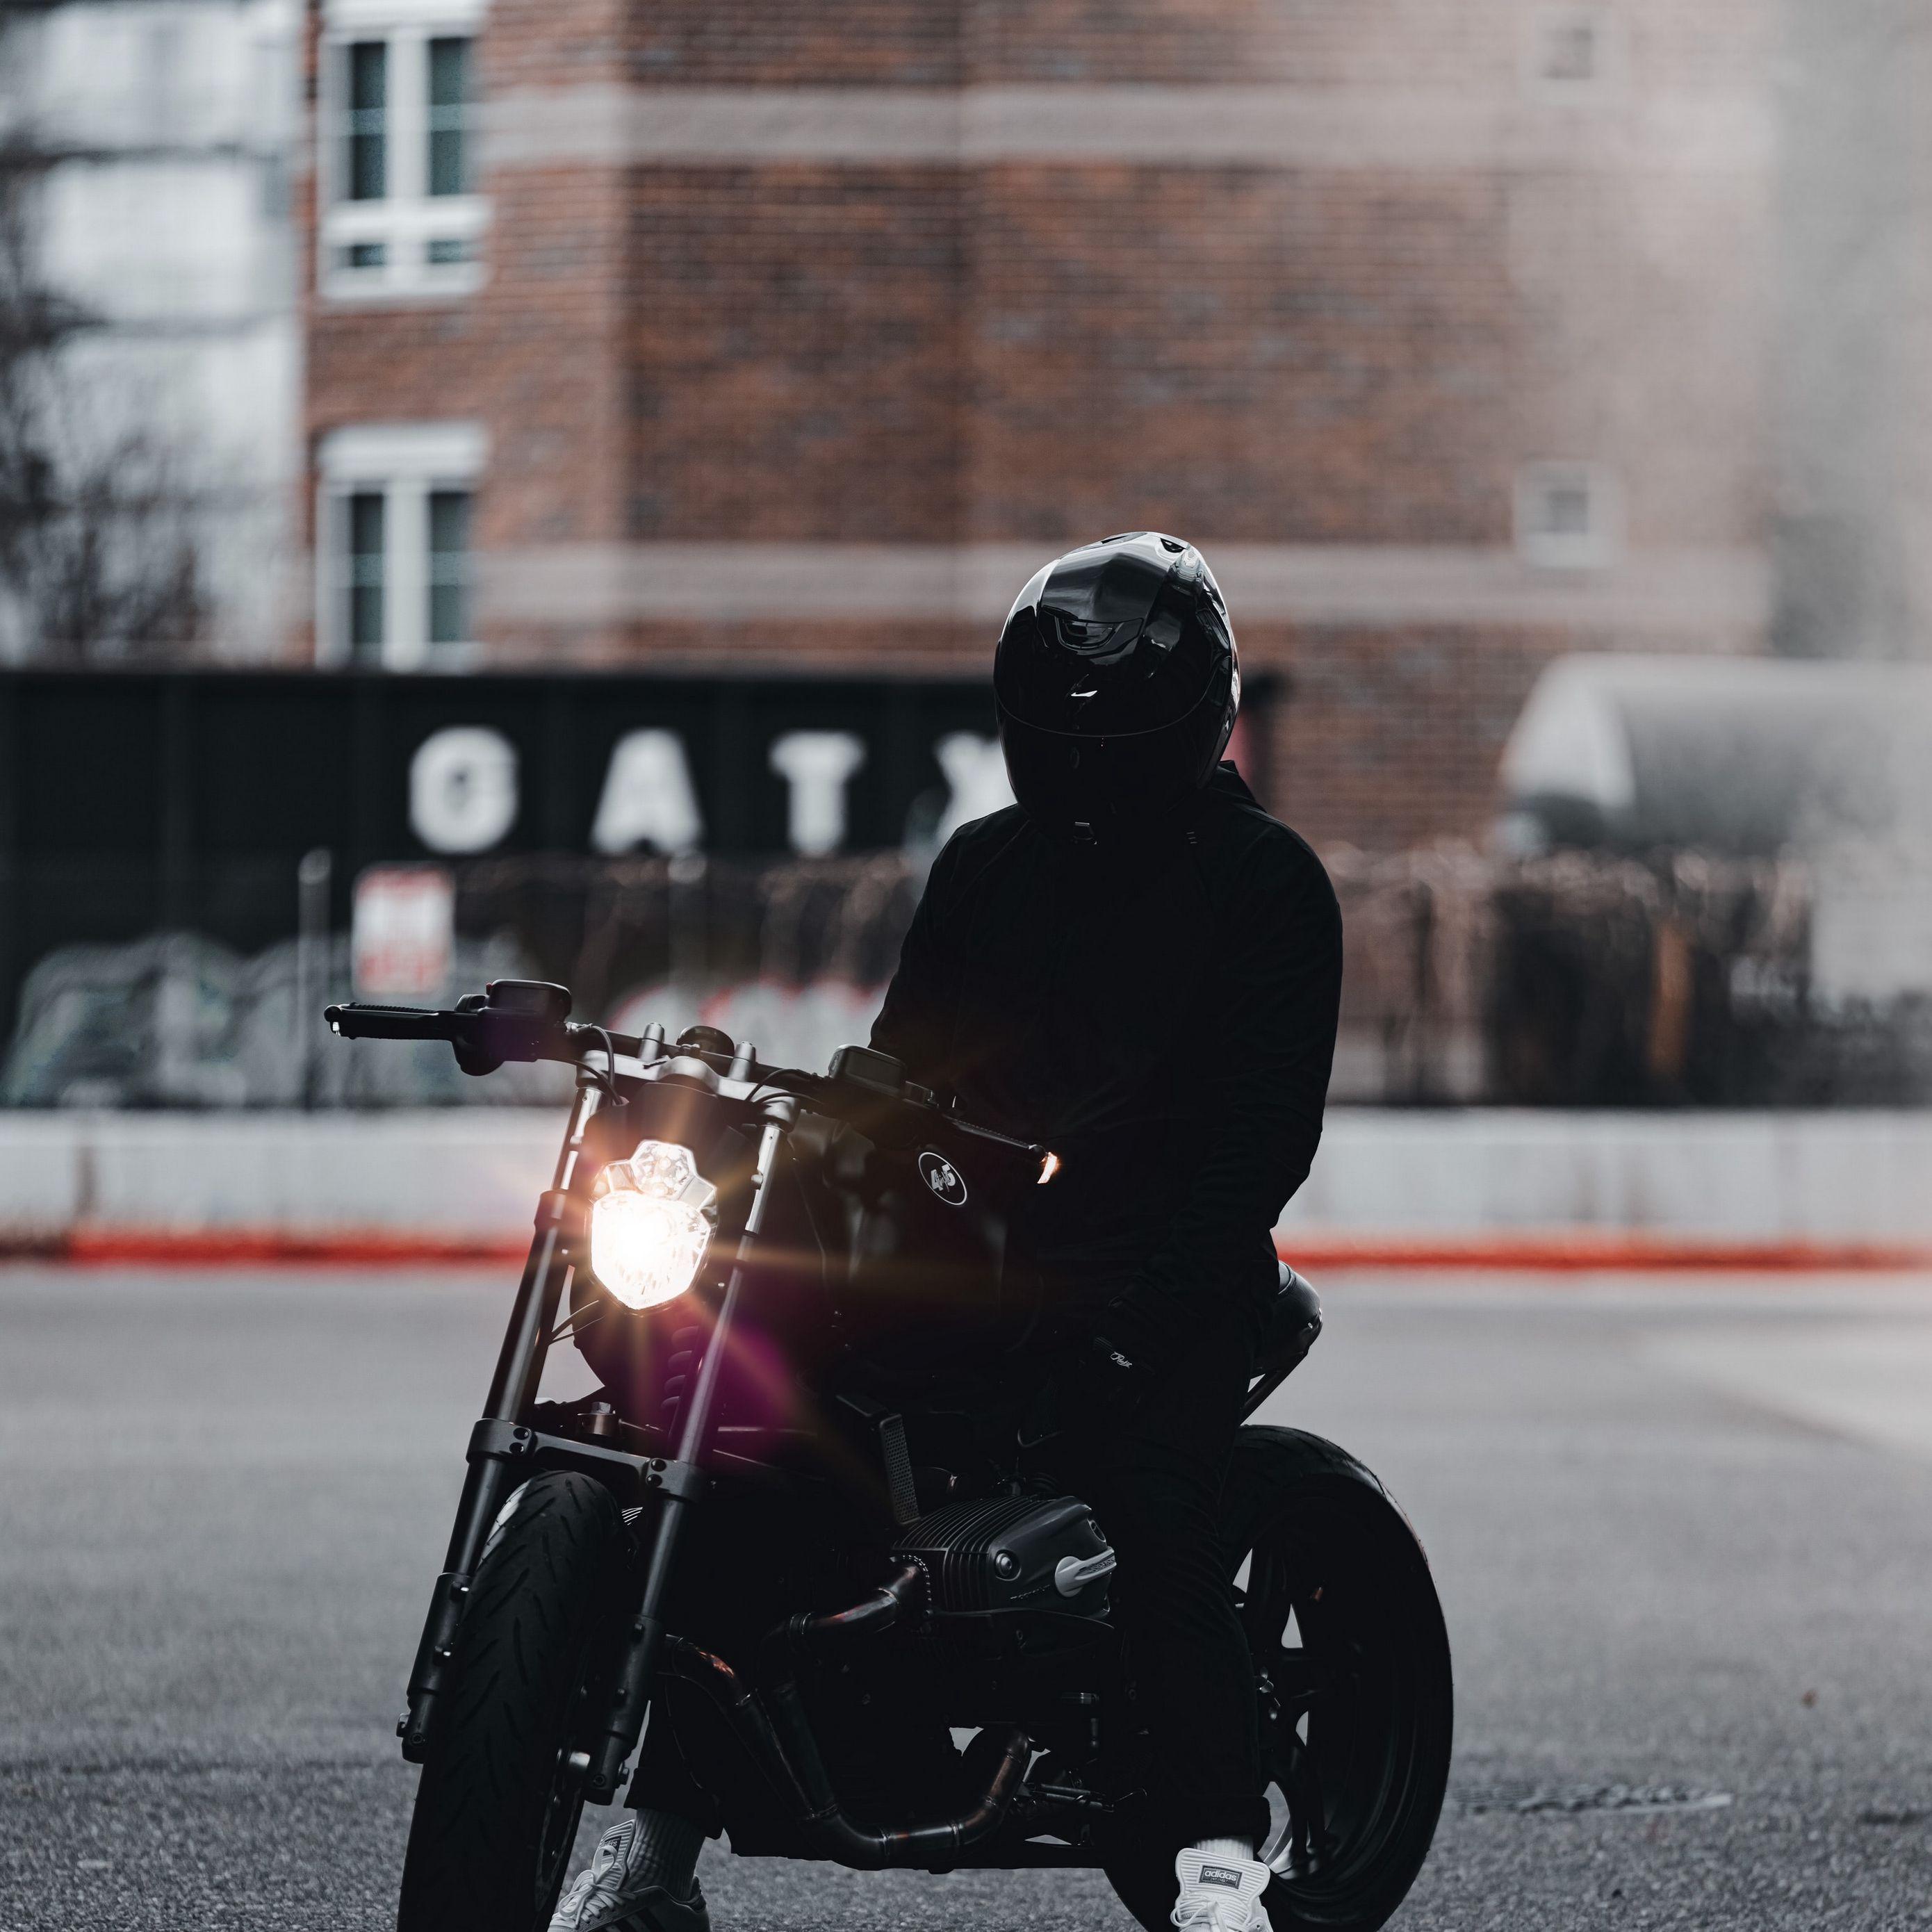 2780x2780 Обои мотоцикл, байк, мотоциклист, черный, свет, дорога